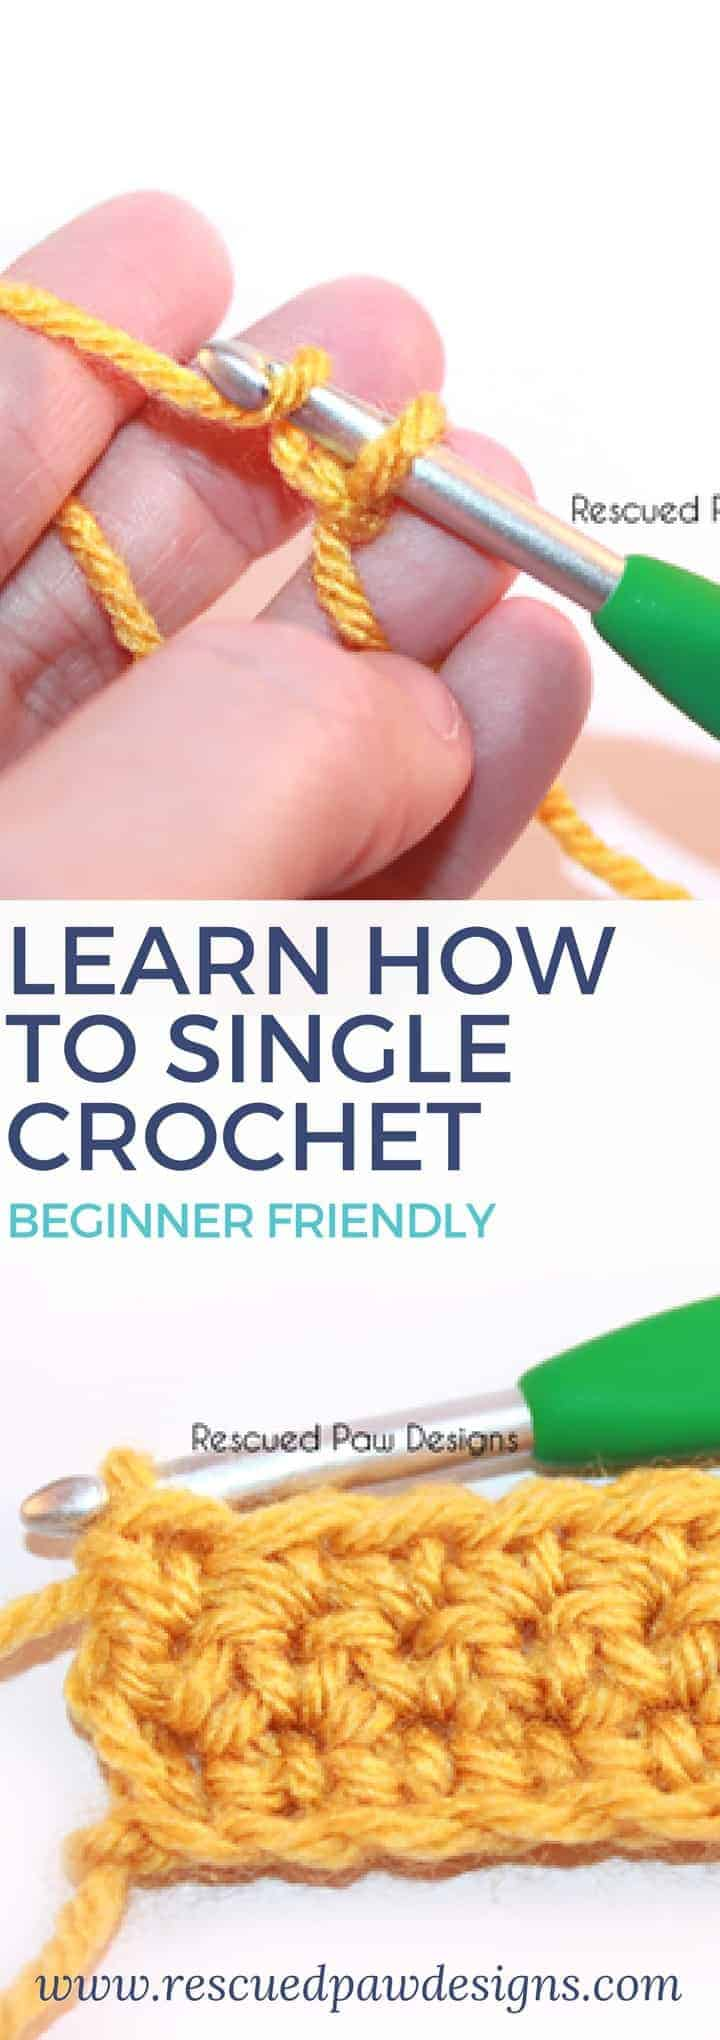 How to do a single crochet